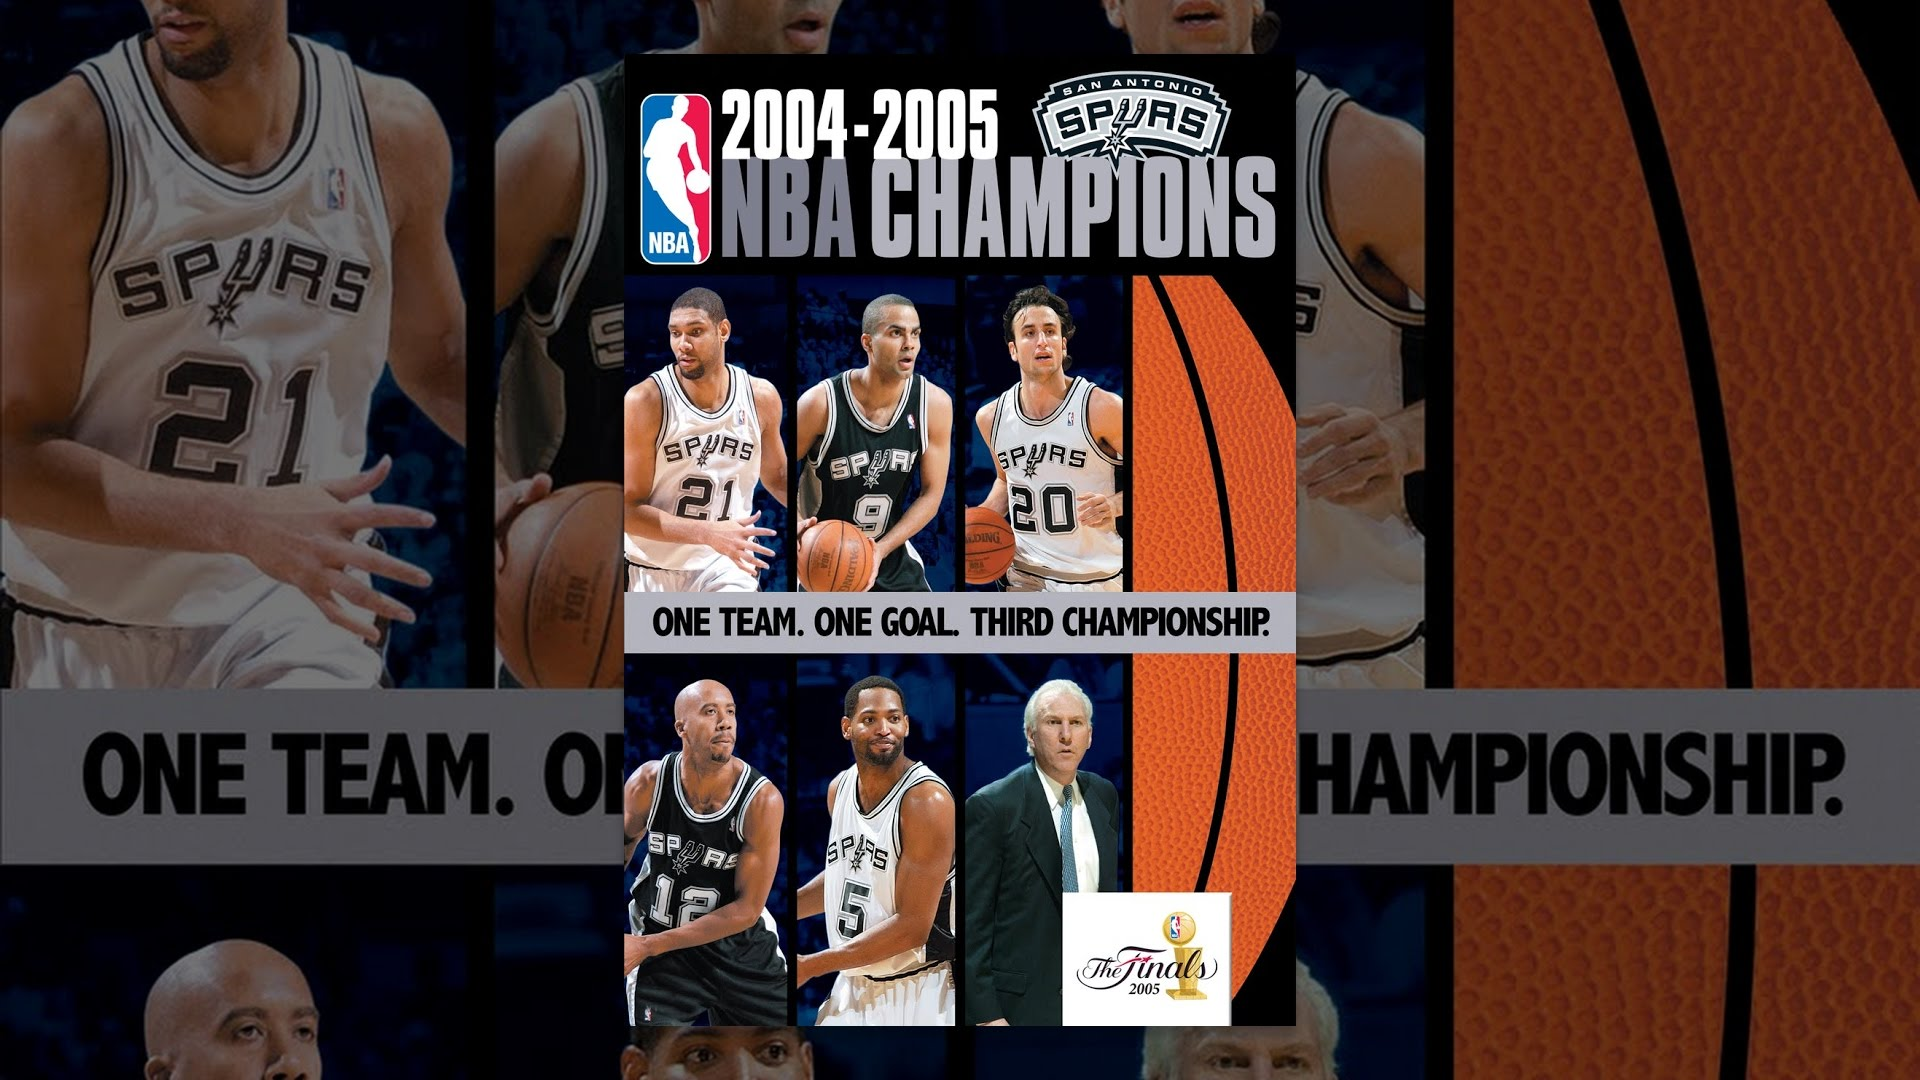 4b7d8189 2005 NBA Champions San Antonio Spurs Robert Horry Jersey PornographyTravis  ...